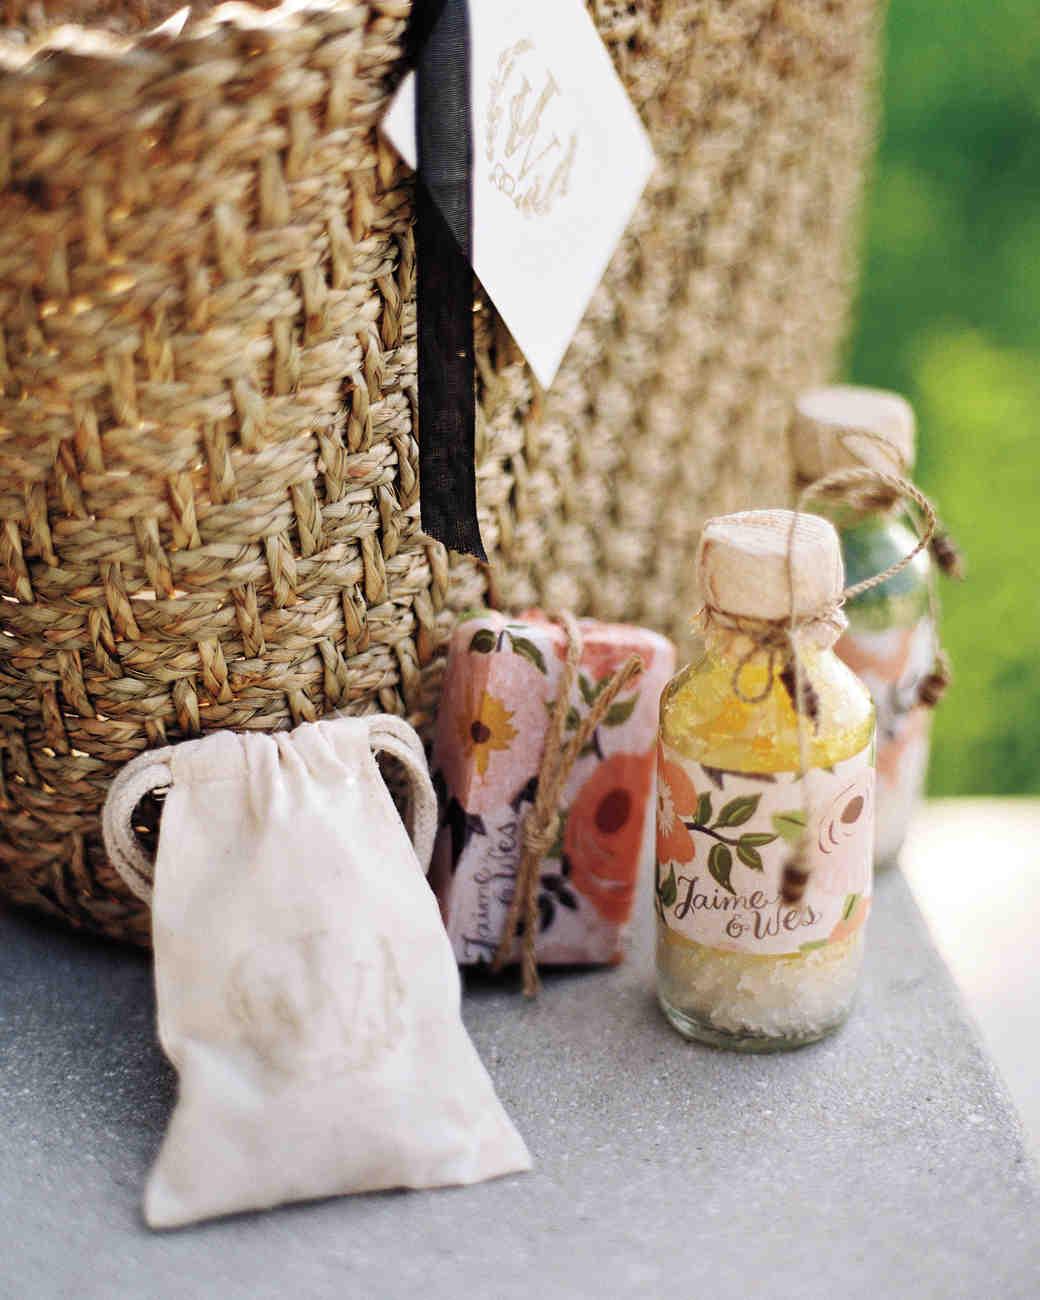 lo-wong-gift-bags-mwds109374.jpg